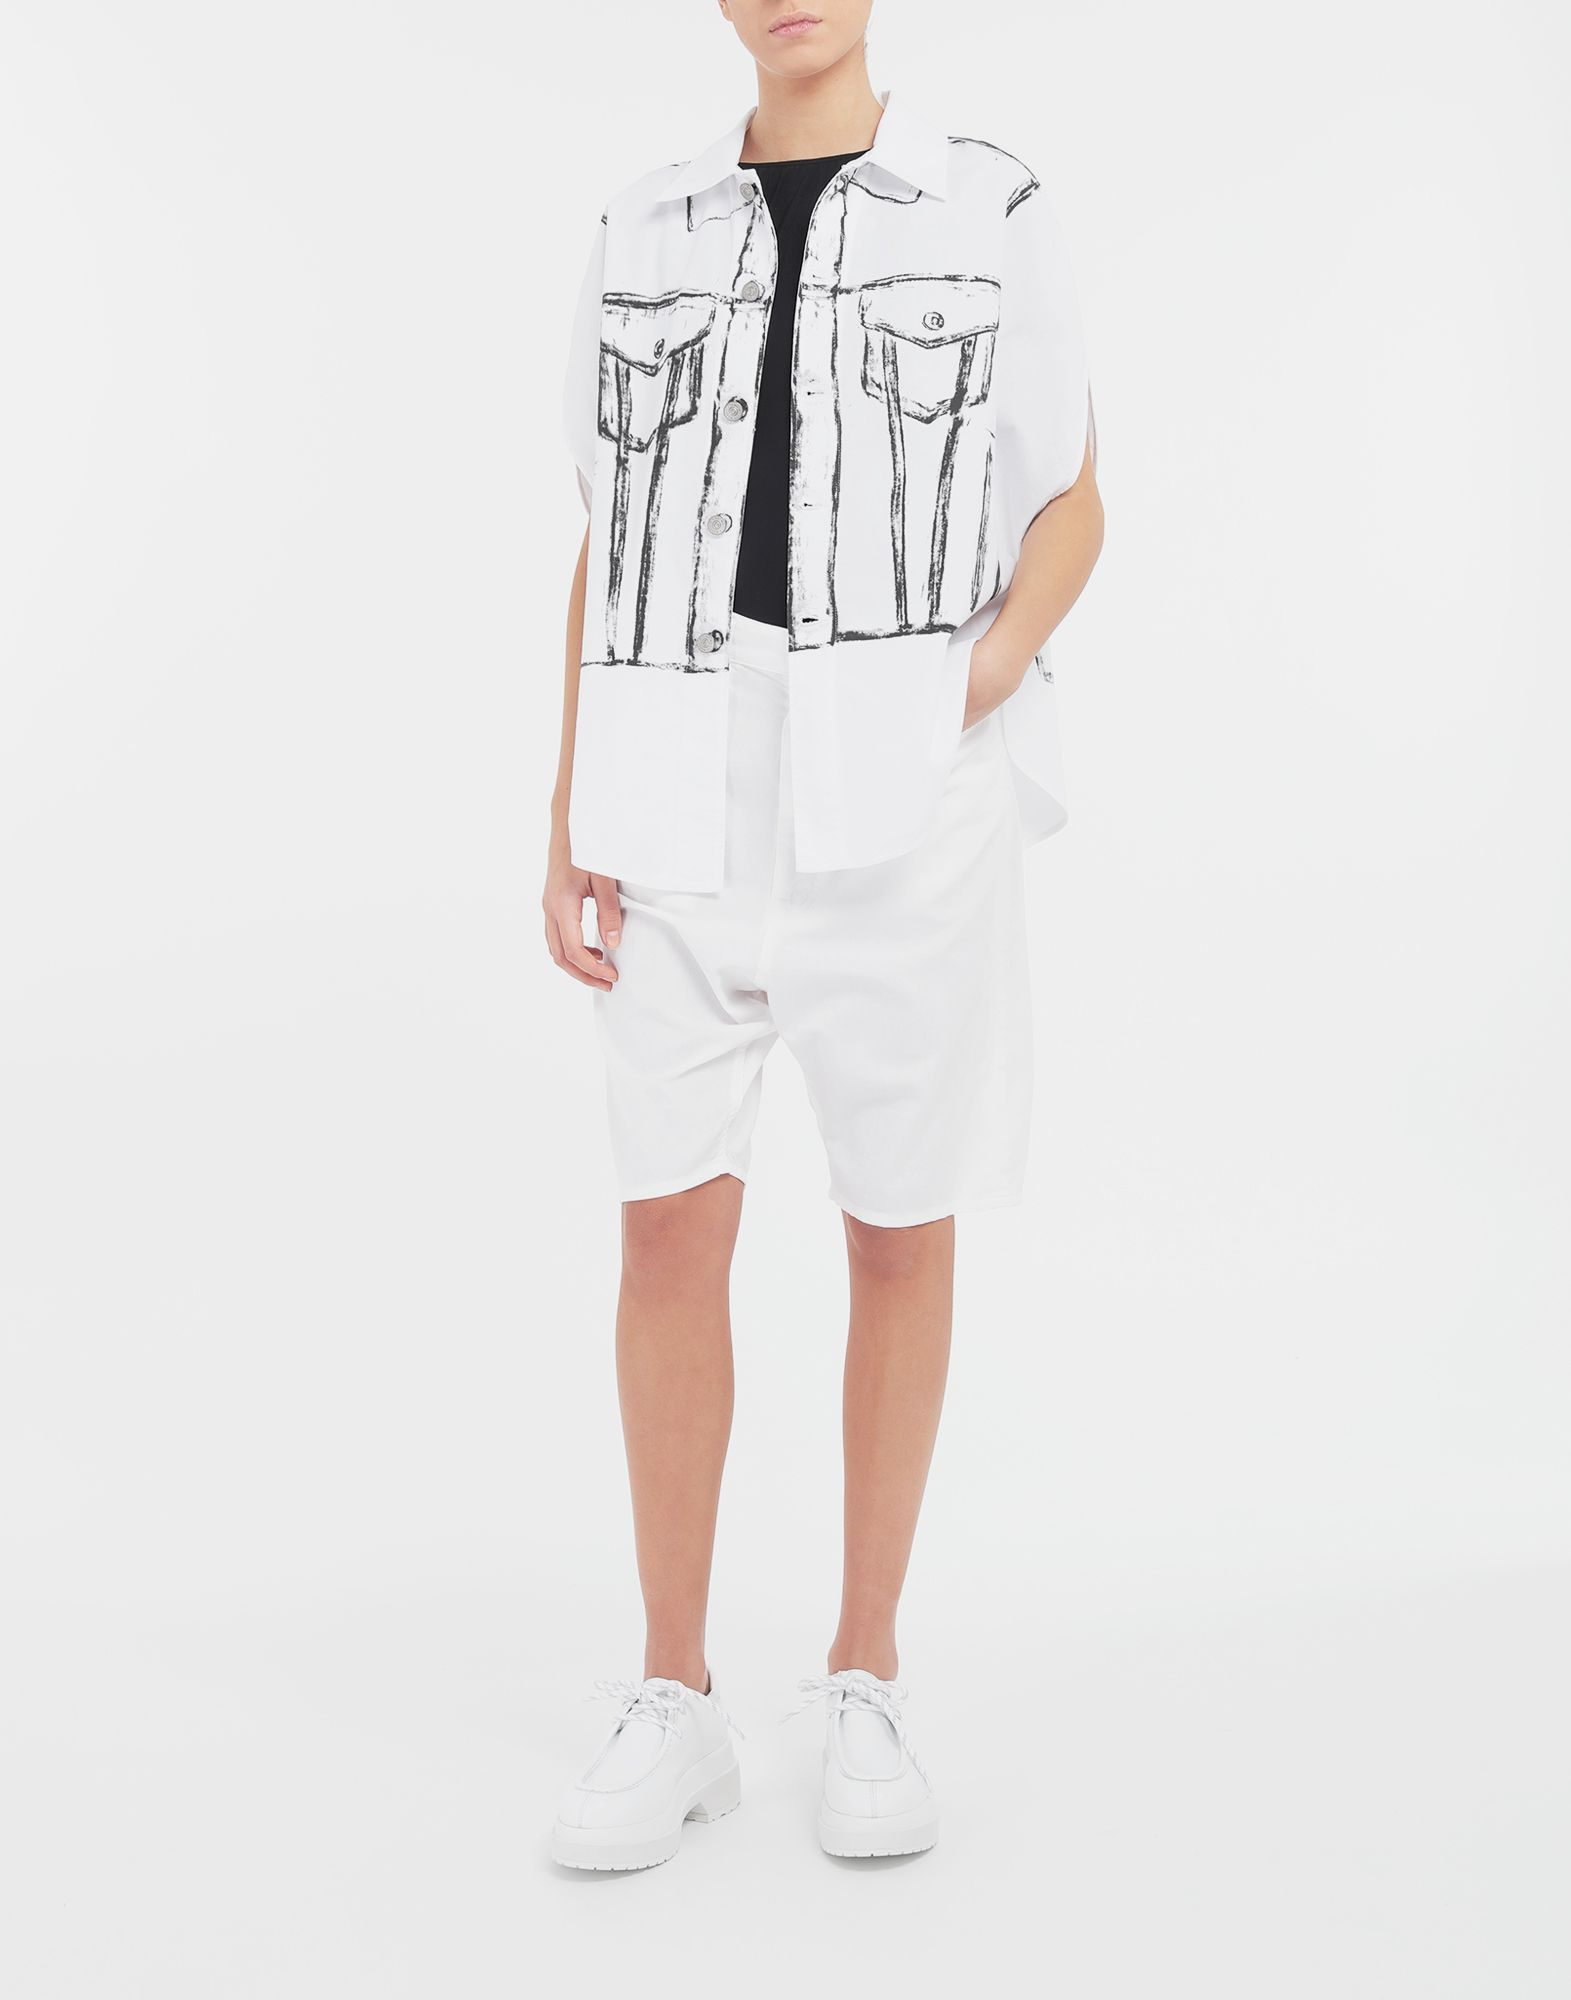 MM6 MAISON MARGIELA Trace Marked printed garment bag shirt Sleeveless shirt Woman d